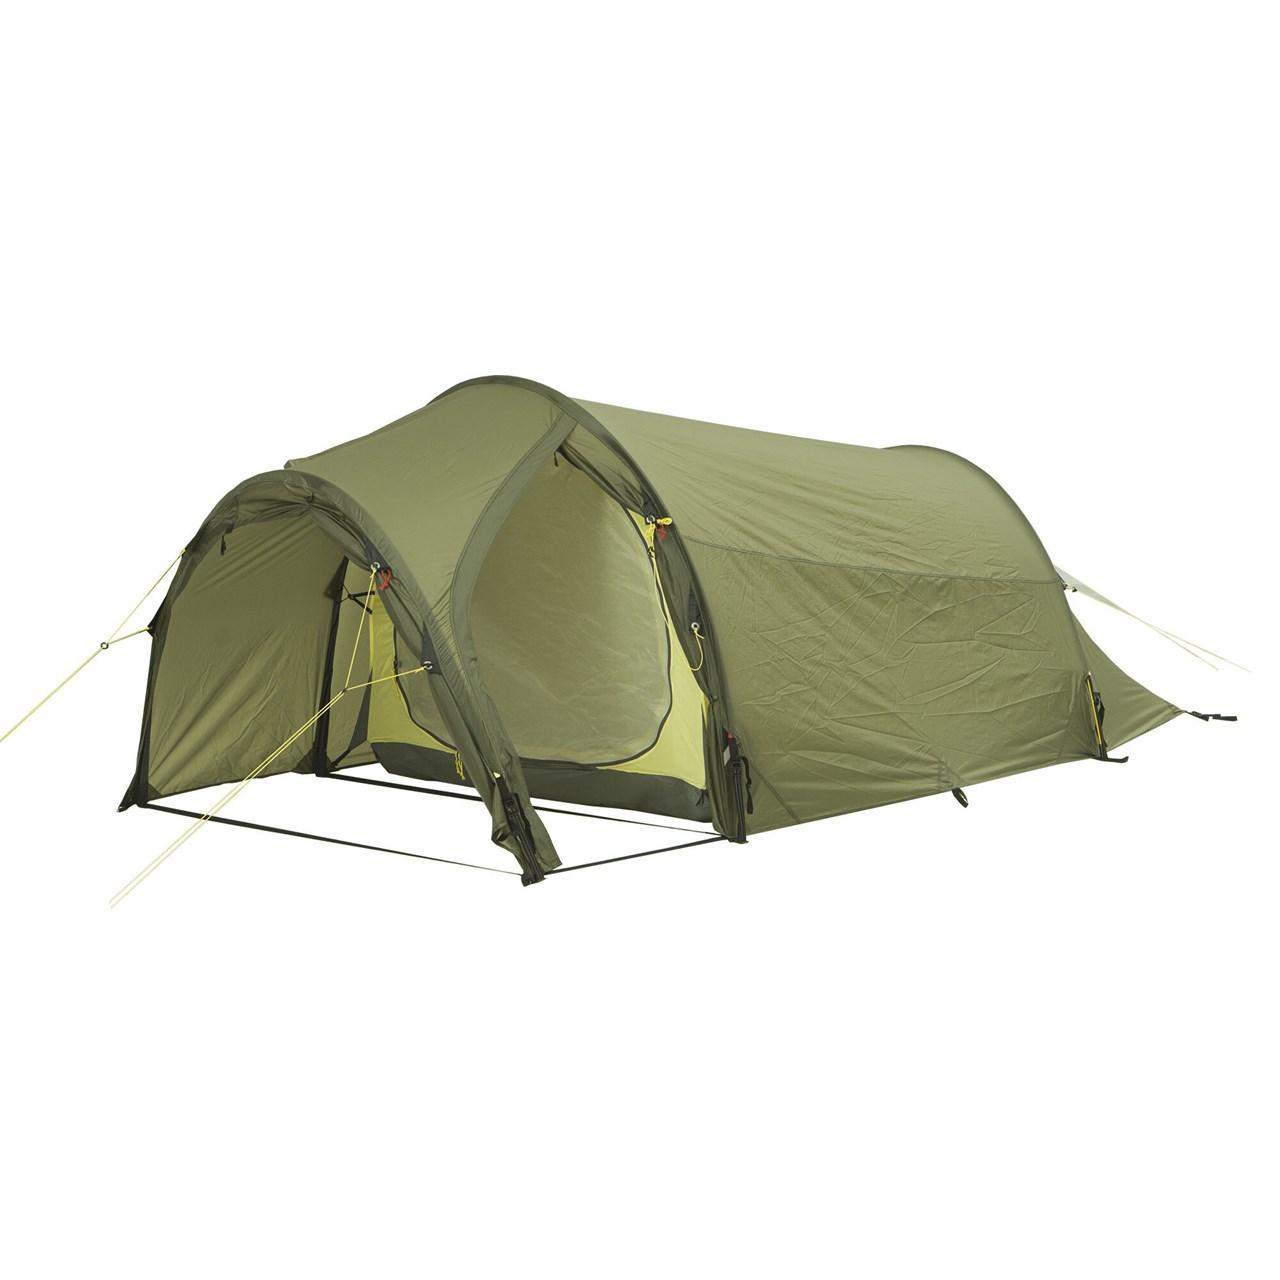 Helsport  Lofoten Pro 3 Camp